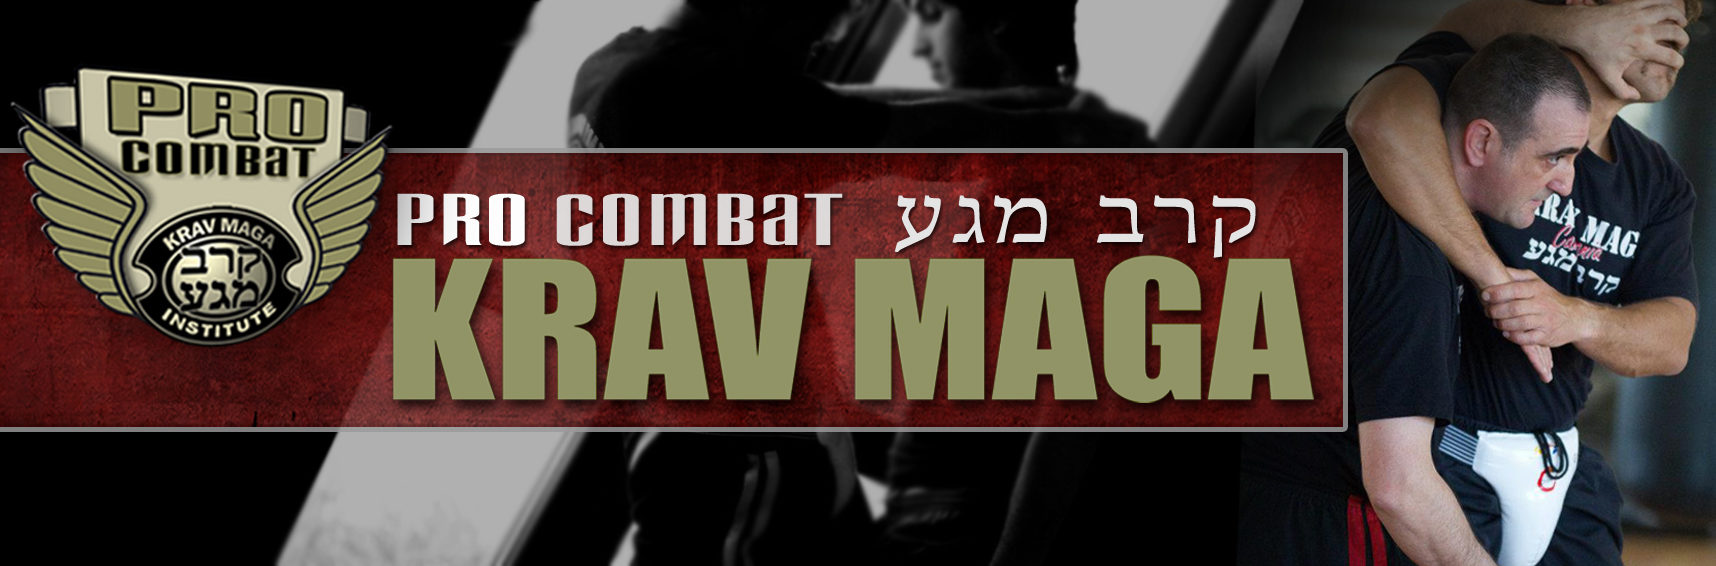 Pro Combat Krav Maga Campania – direttore tecnico Vincenzo Gaudino